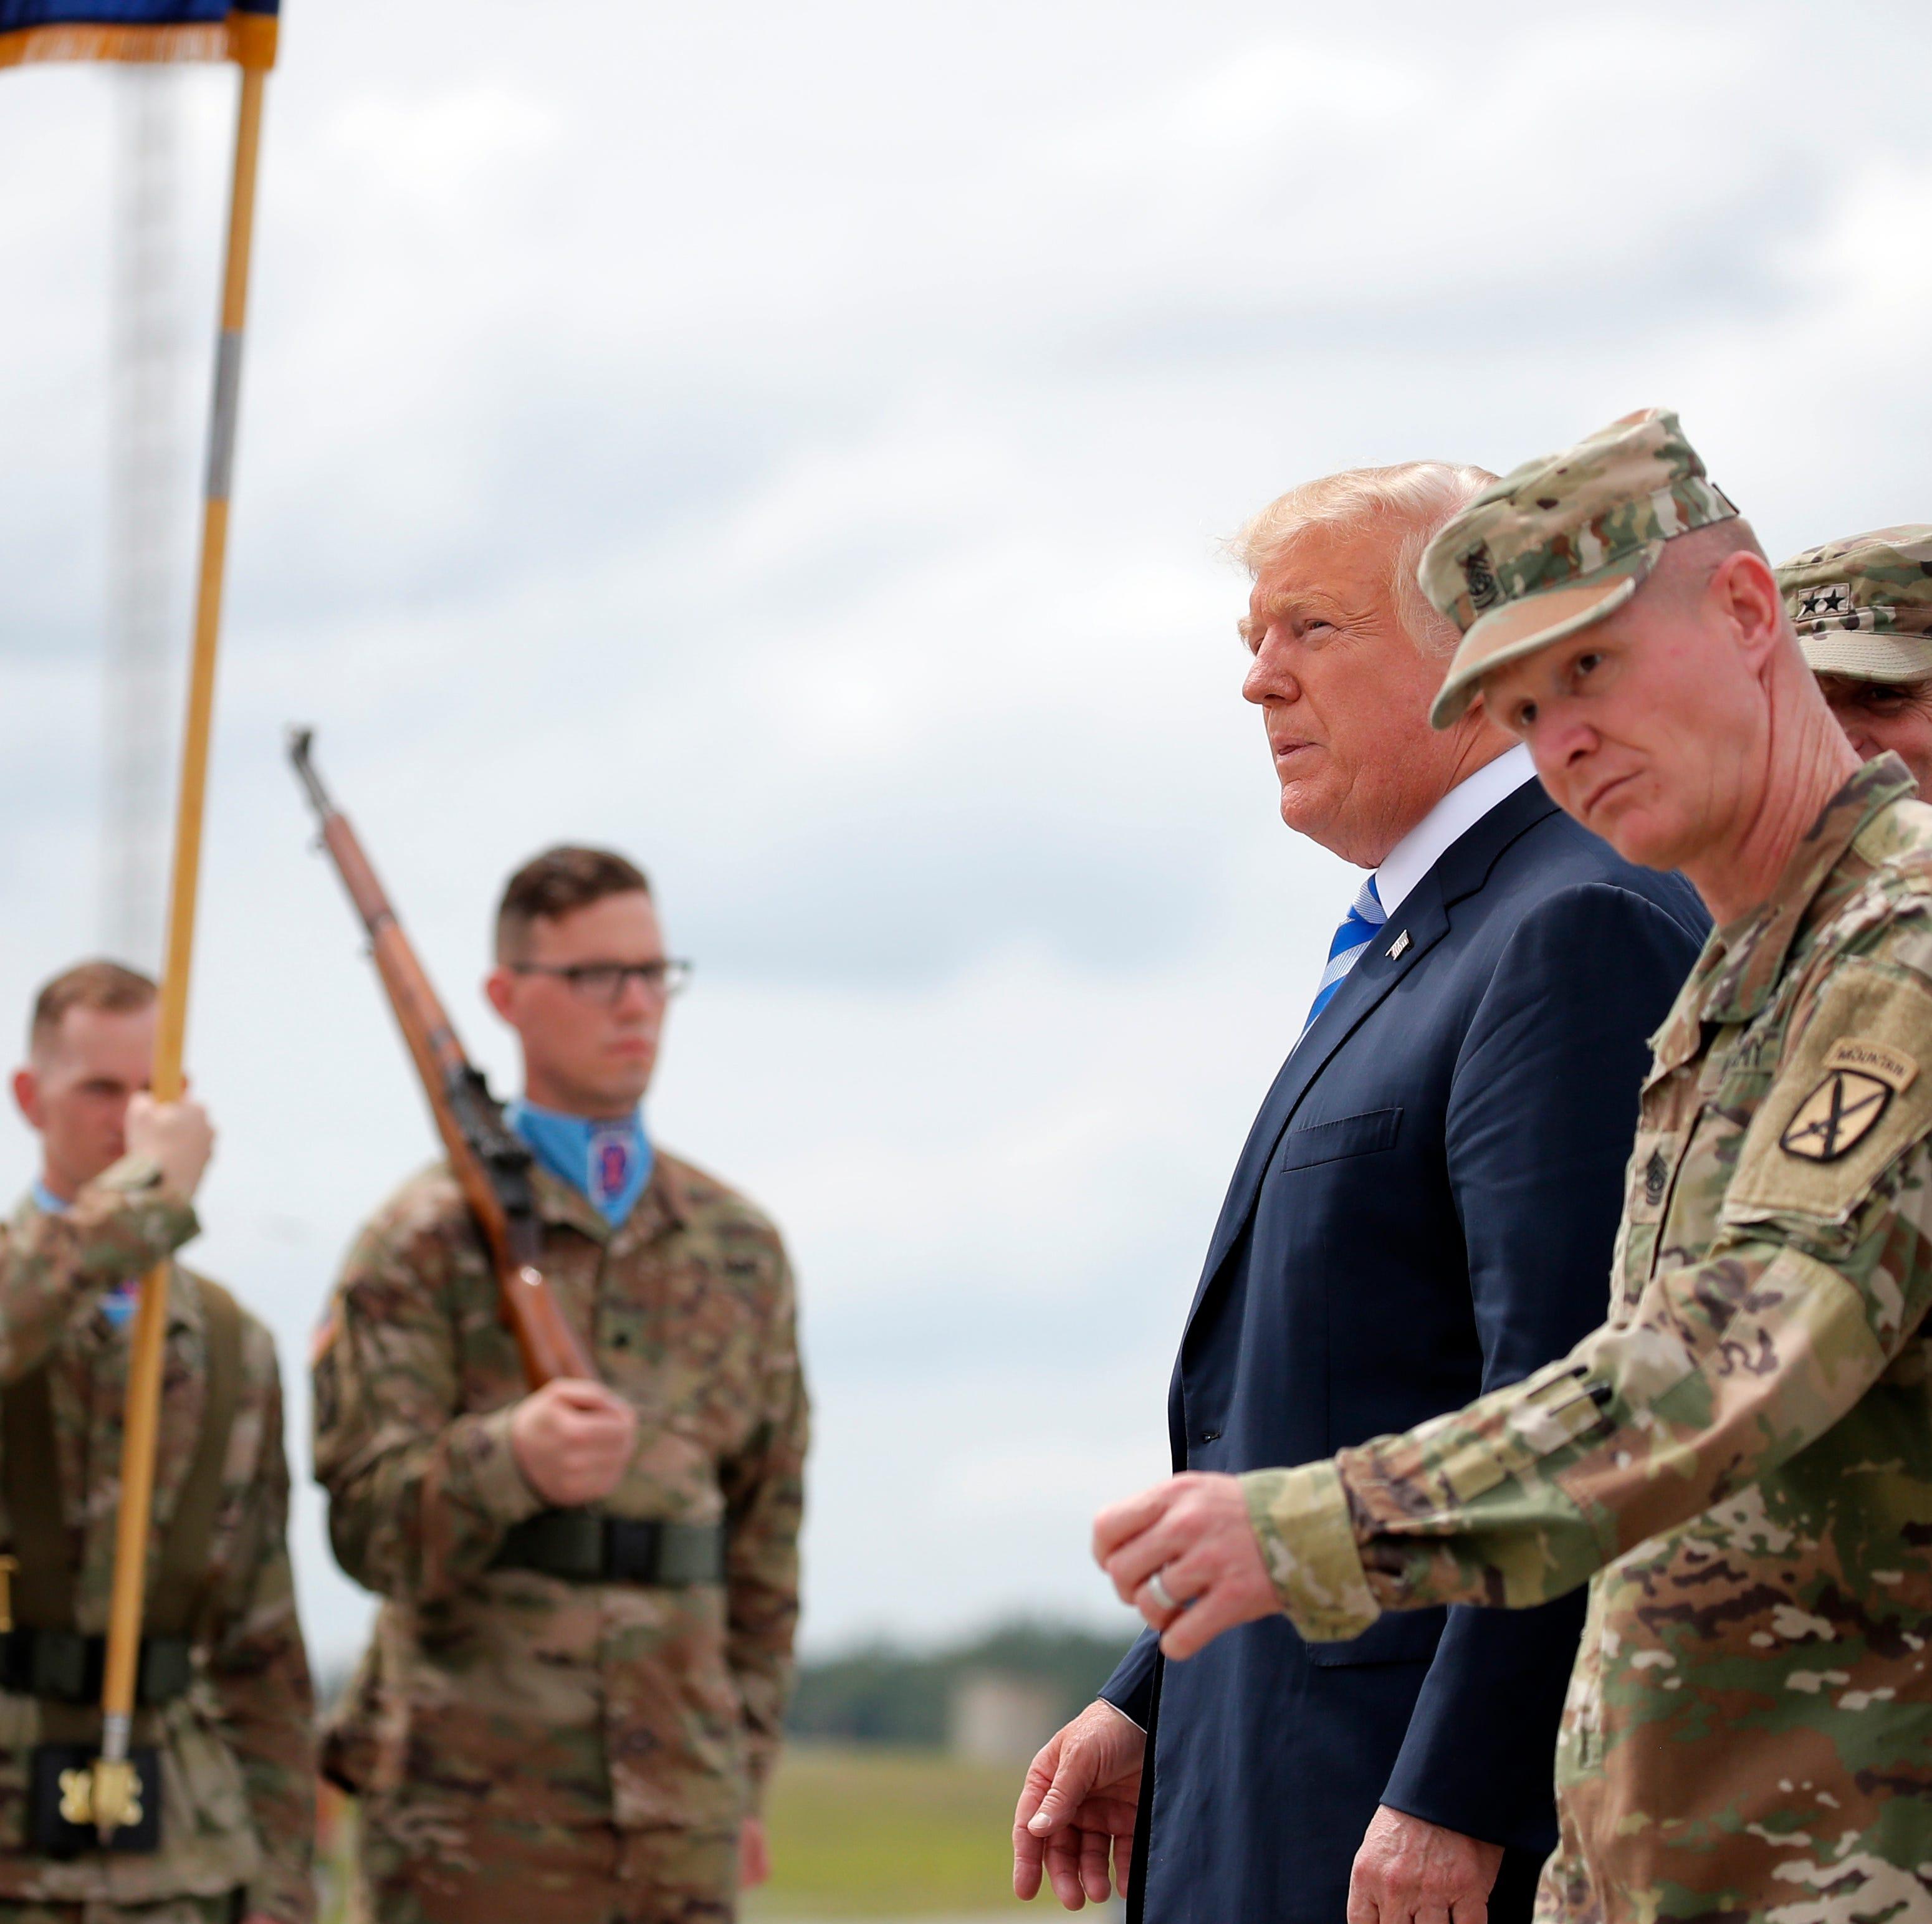 Trump signs McCain defense bill that boosts military pay; no mention of senator